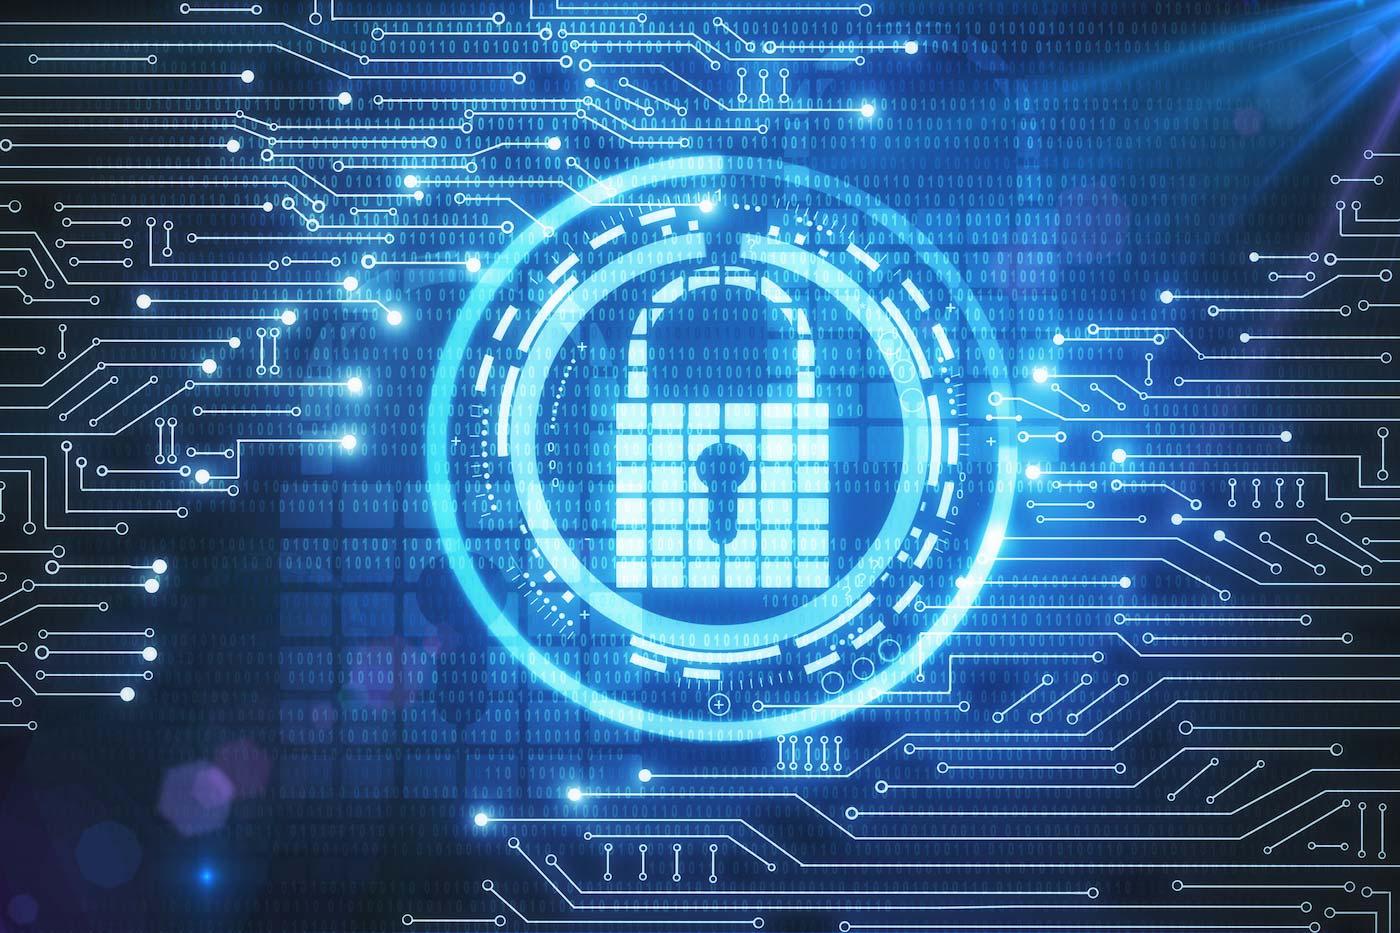 CVE-2021-3546[78]: Akkadian Console Server Vulnerabilities (FIXED)